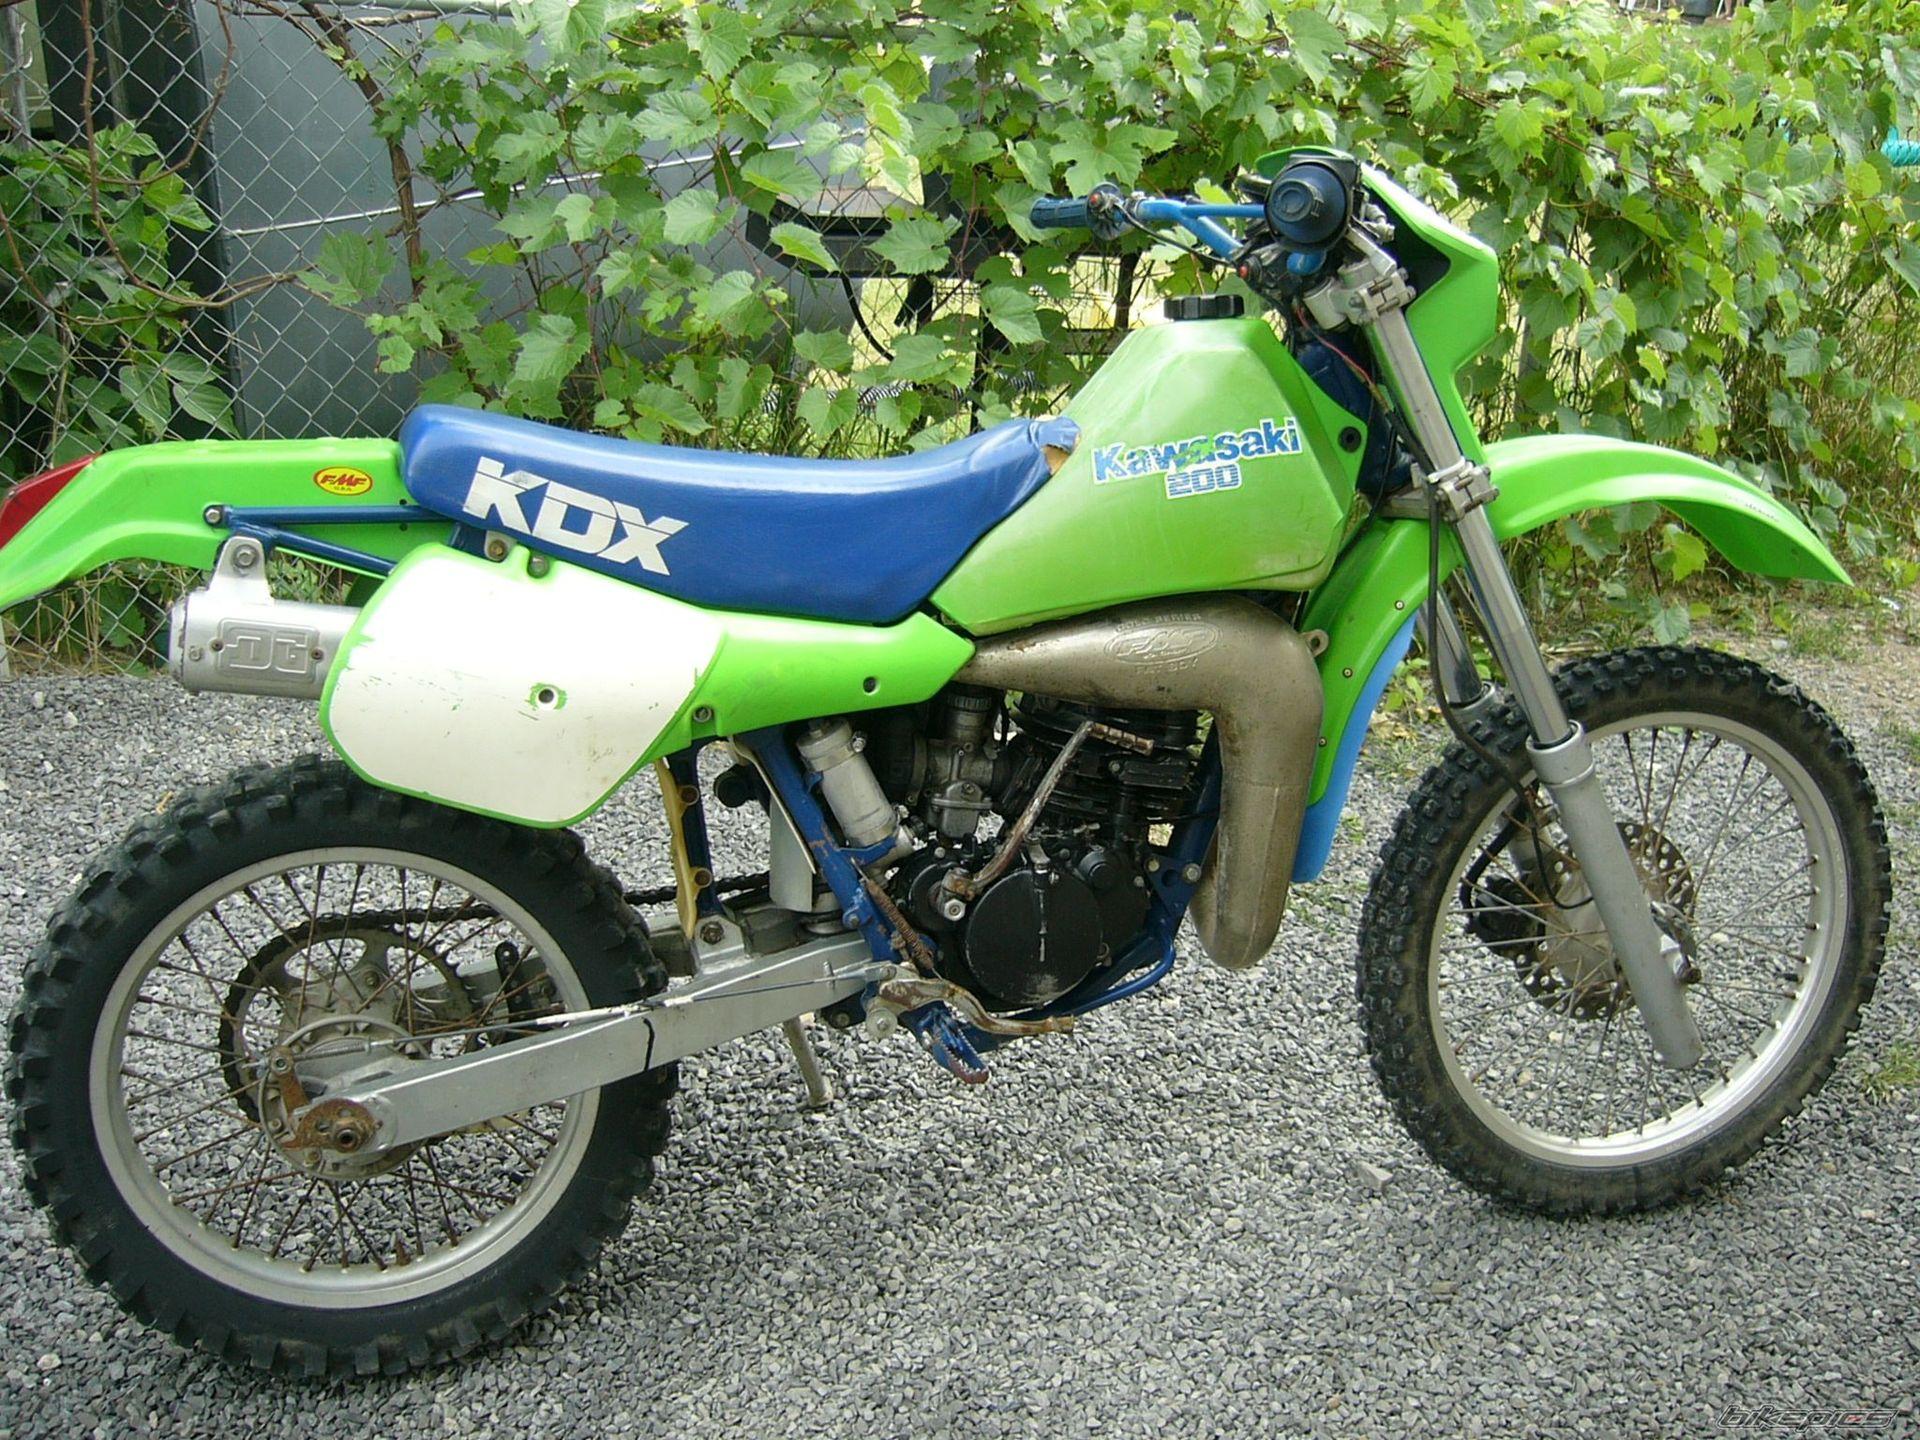 Kawasaki Zoil Capacity